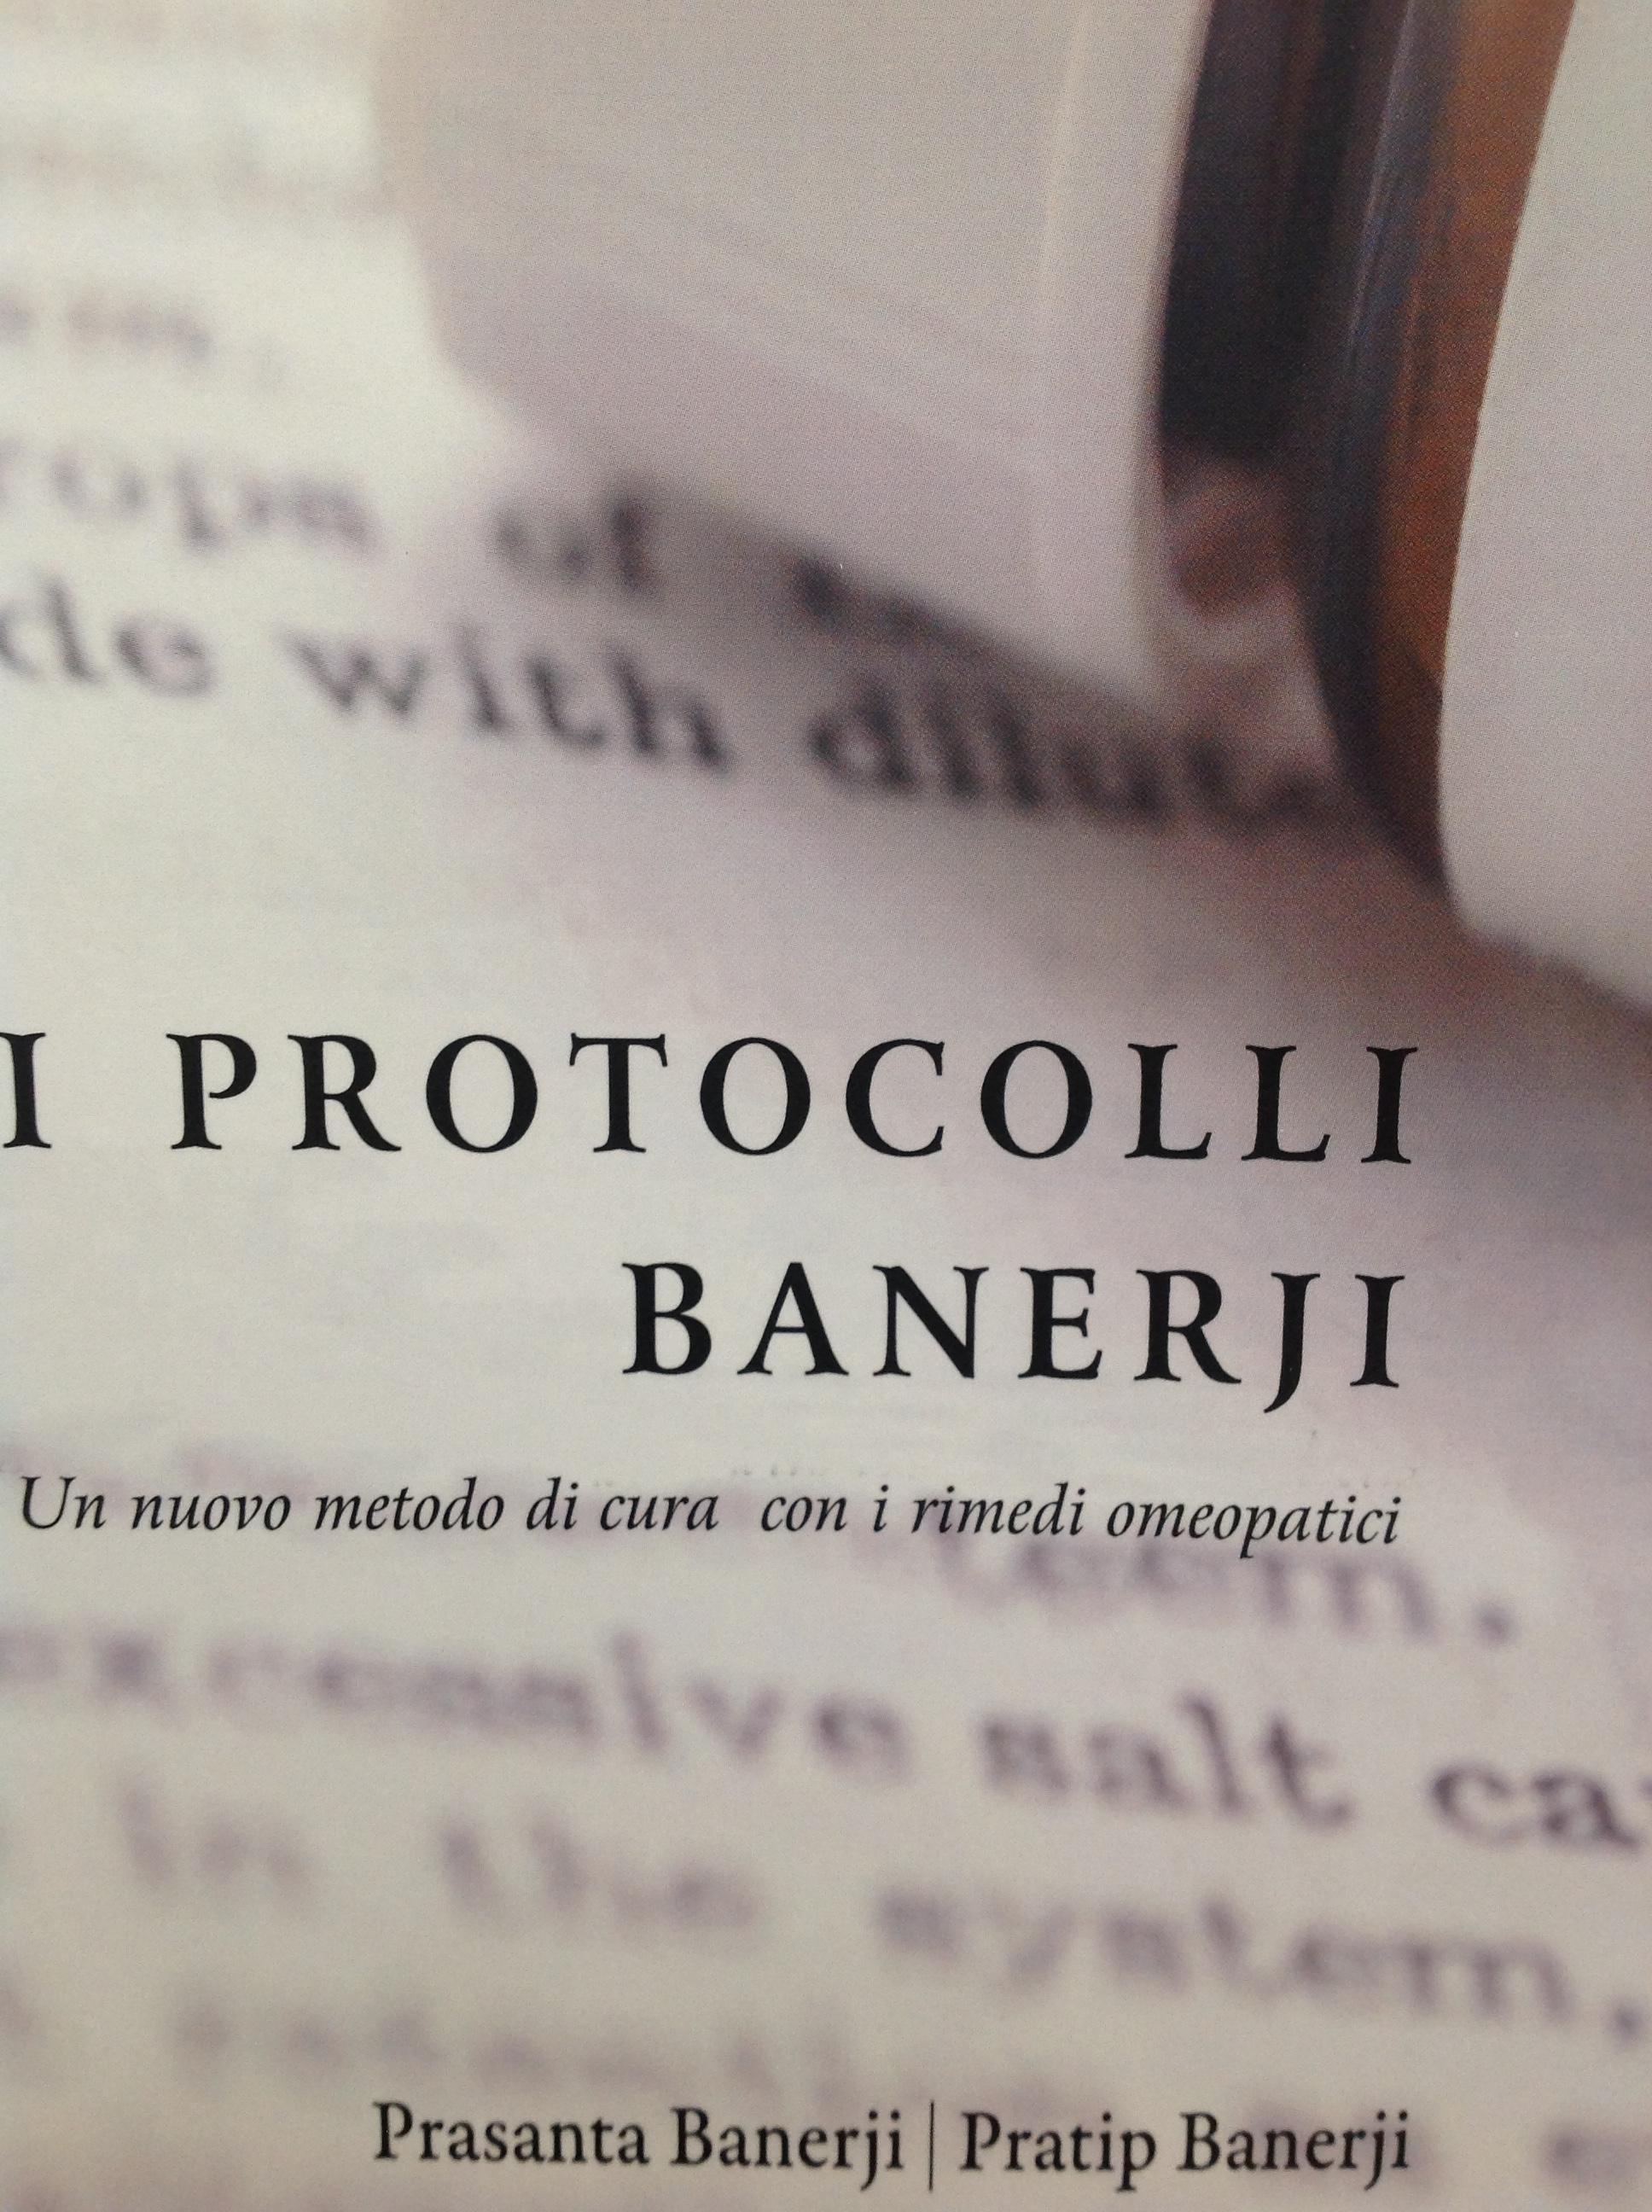 I Protocolli Banerji